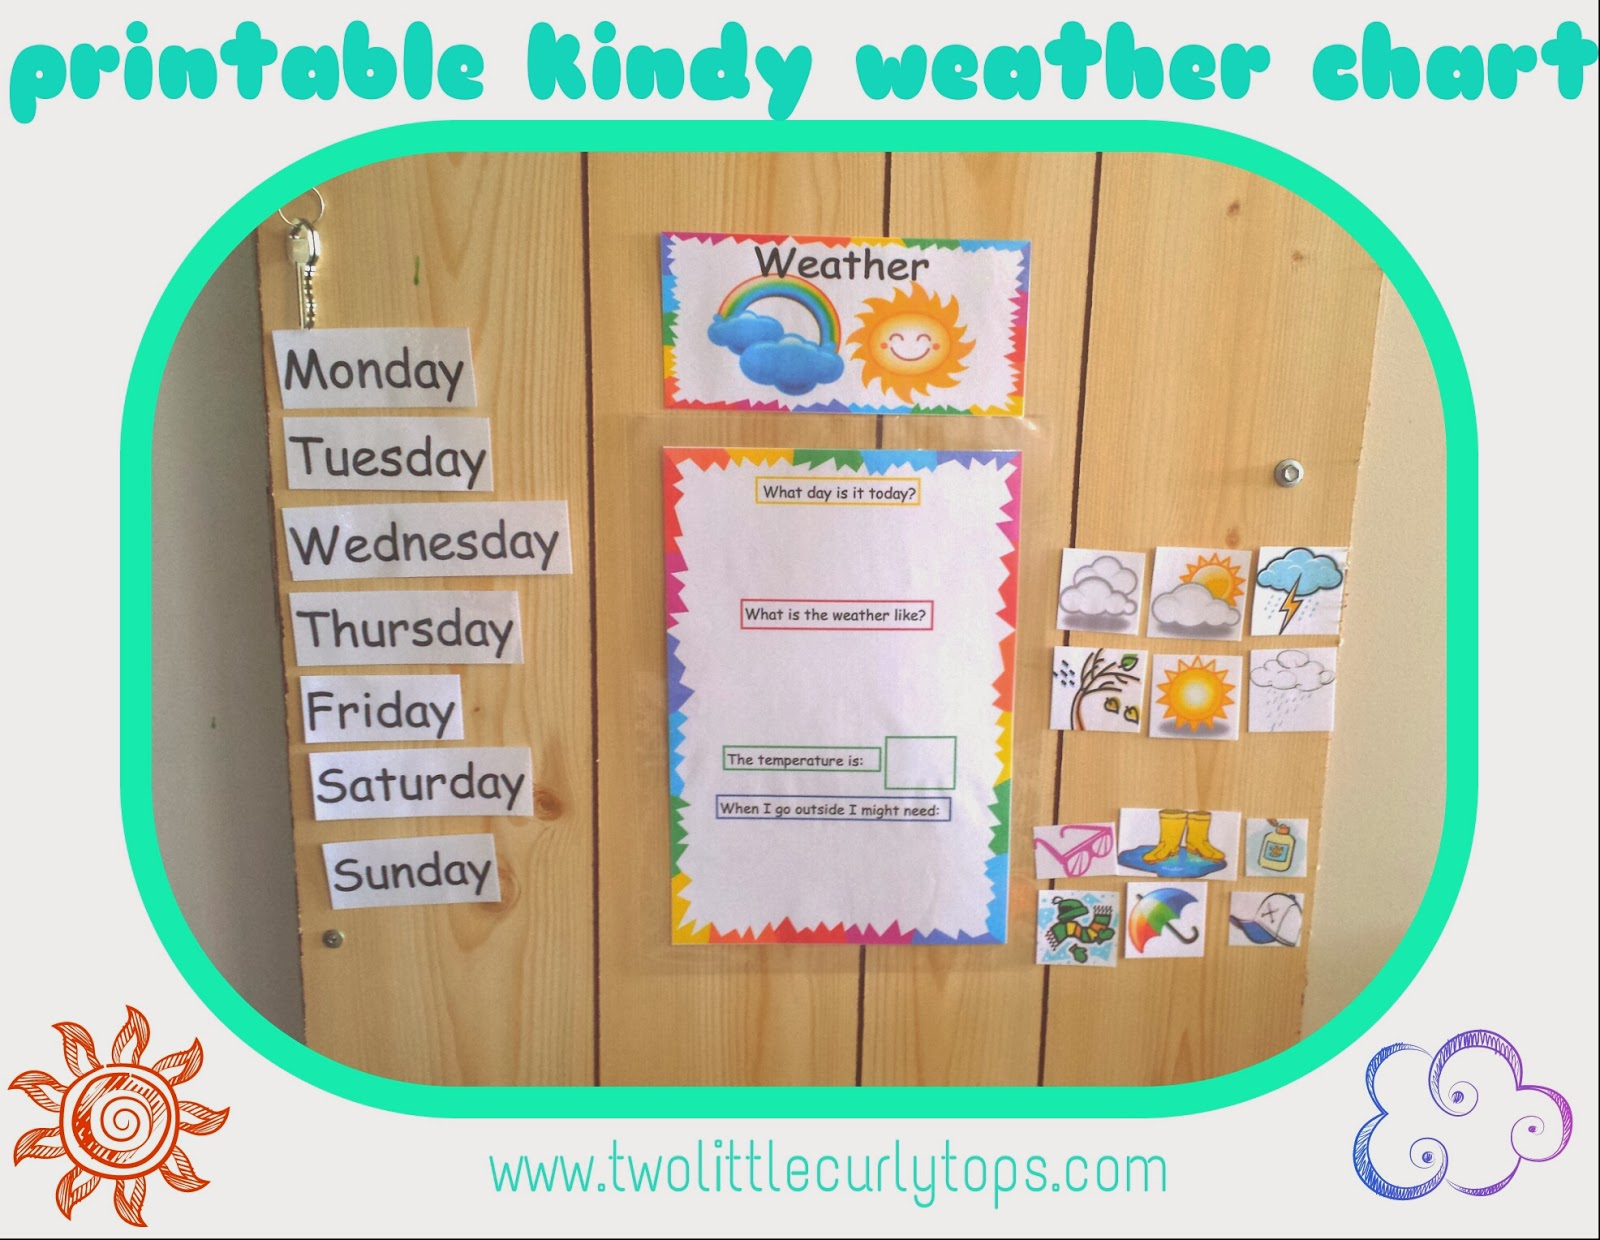 Simple kindy pre k weather chart printable